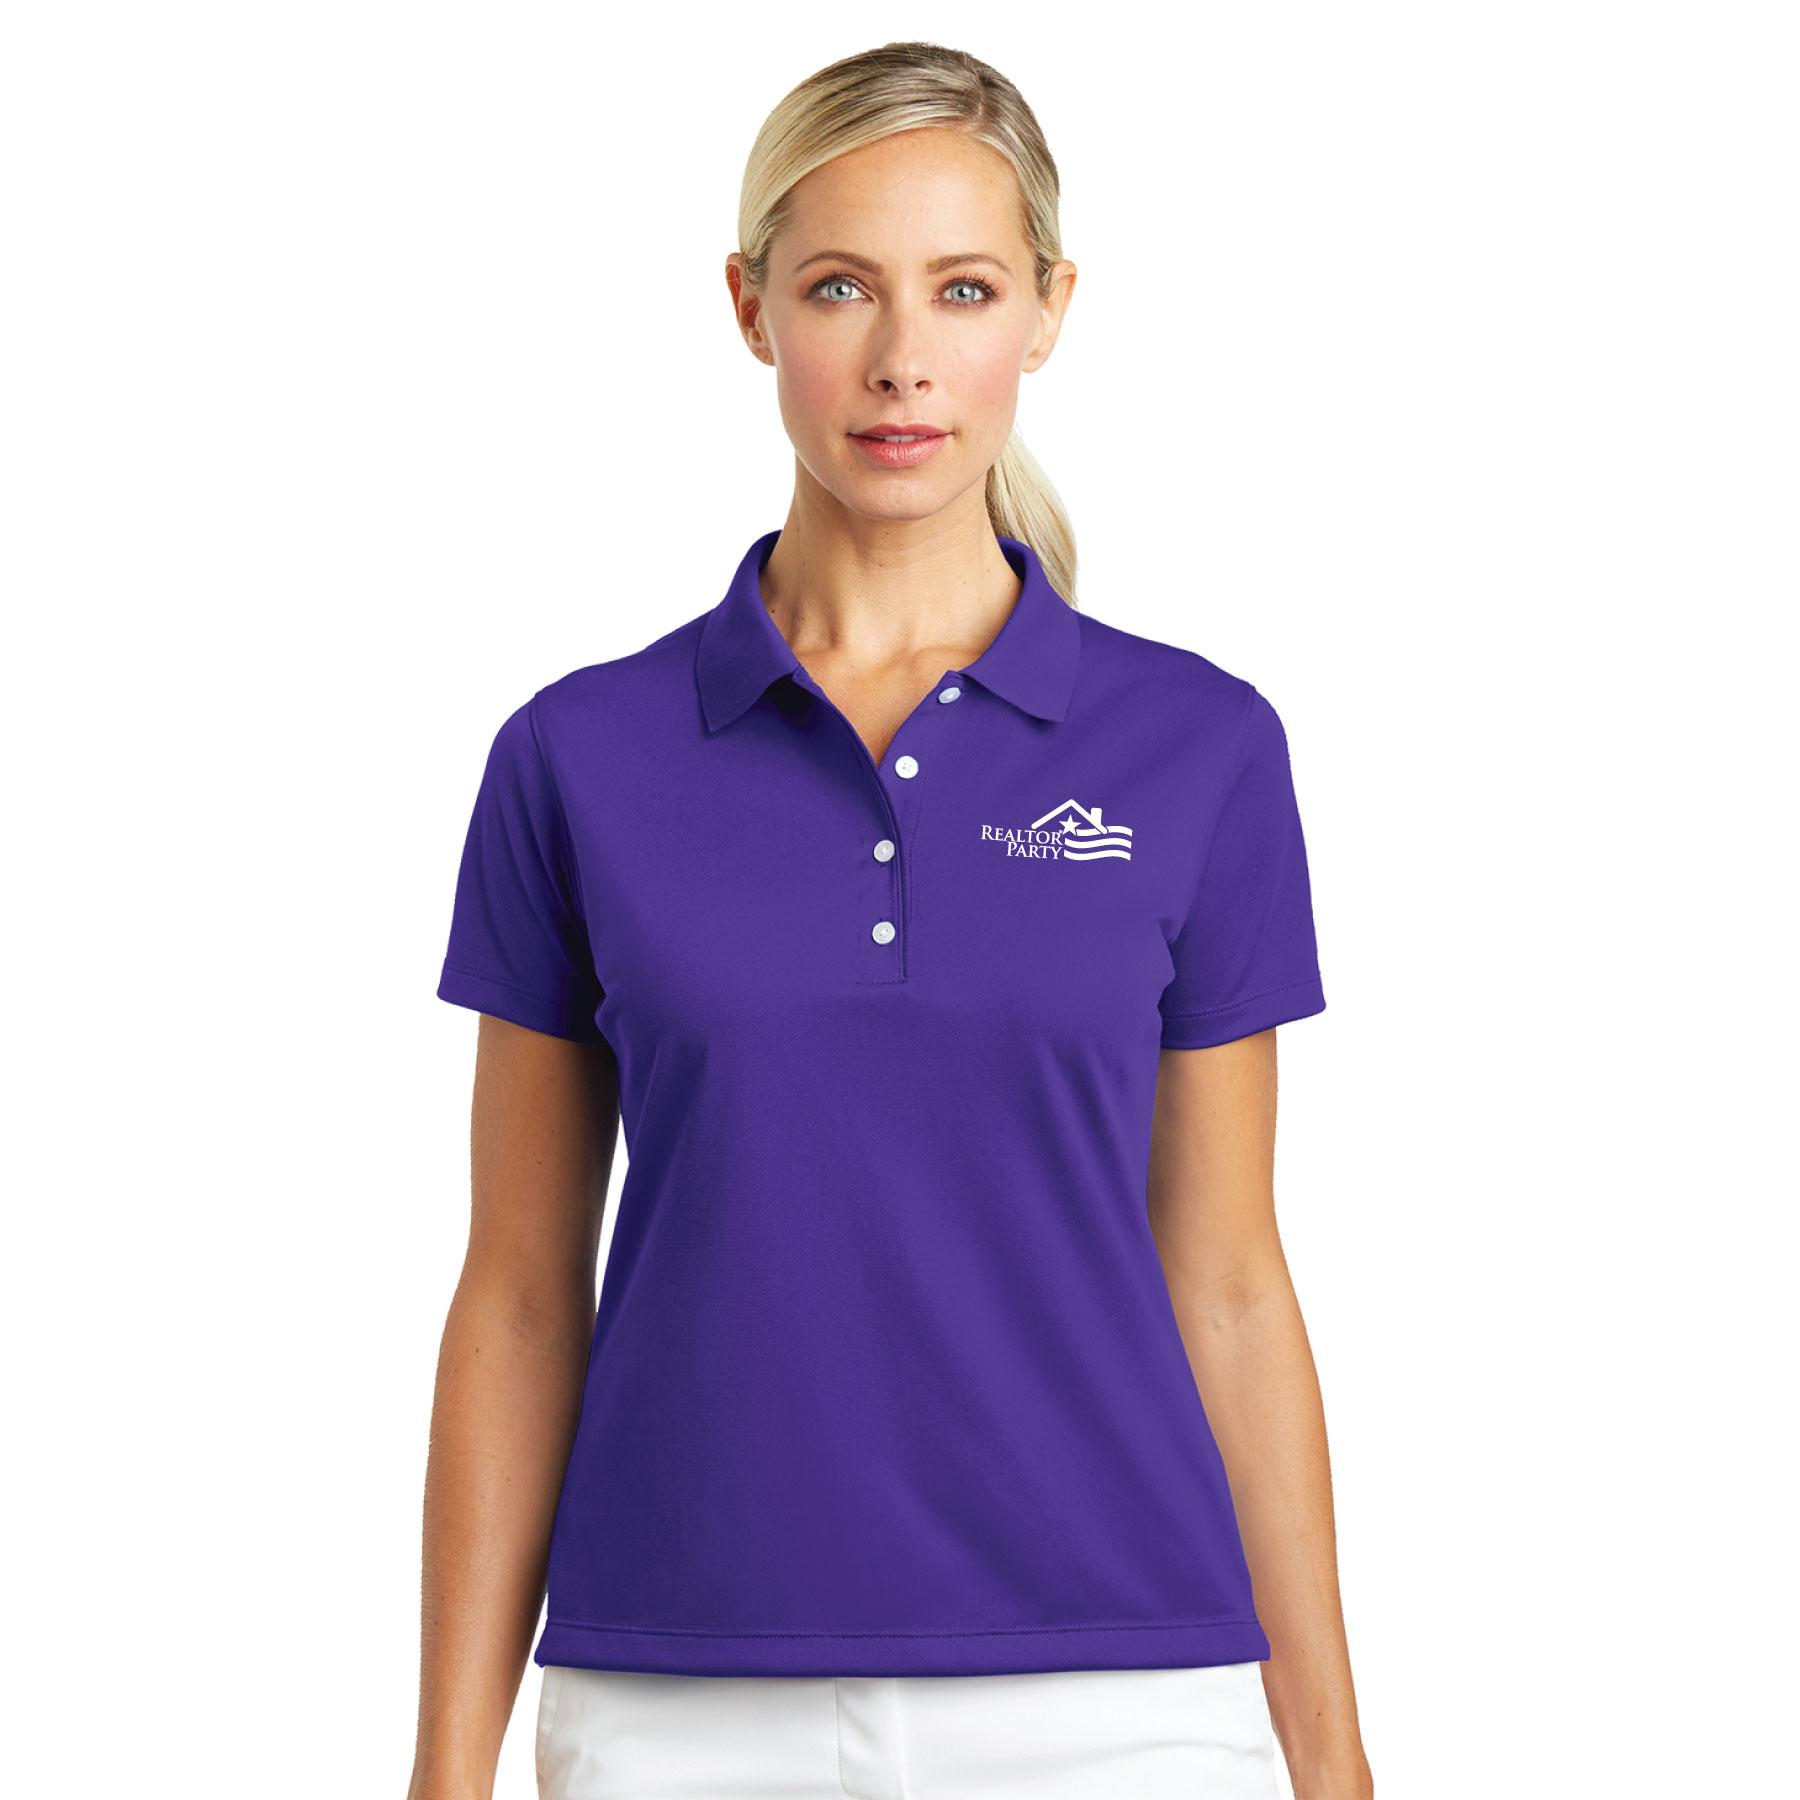 REALTOR® Party Ladies Nike® Tech Basic Dri-FIT® Polo Polos,Nikes,Swoshes,Golfs,Stripes,RP,RPAC,Parties,R.P.